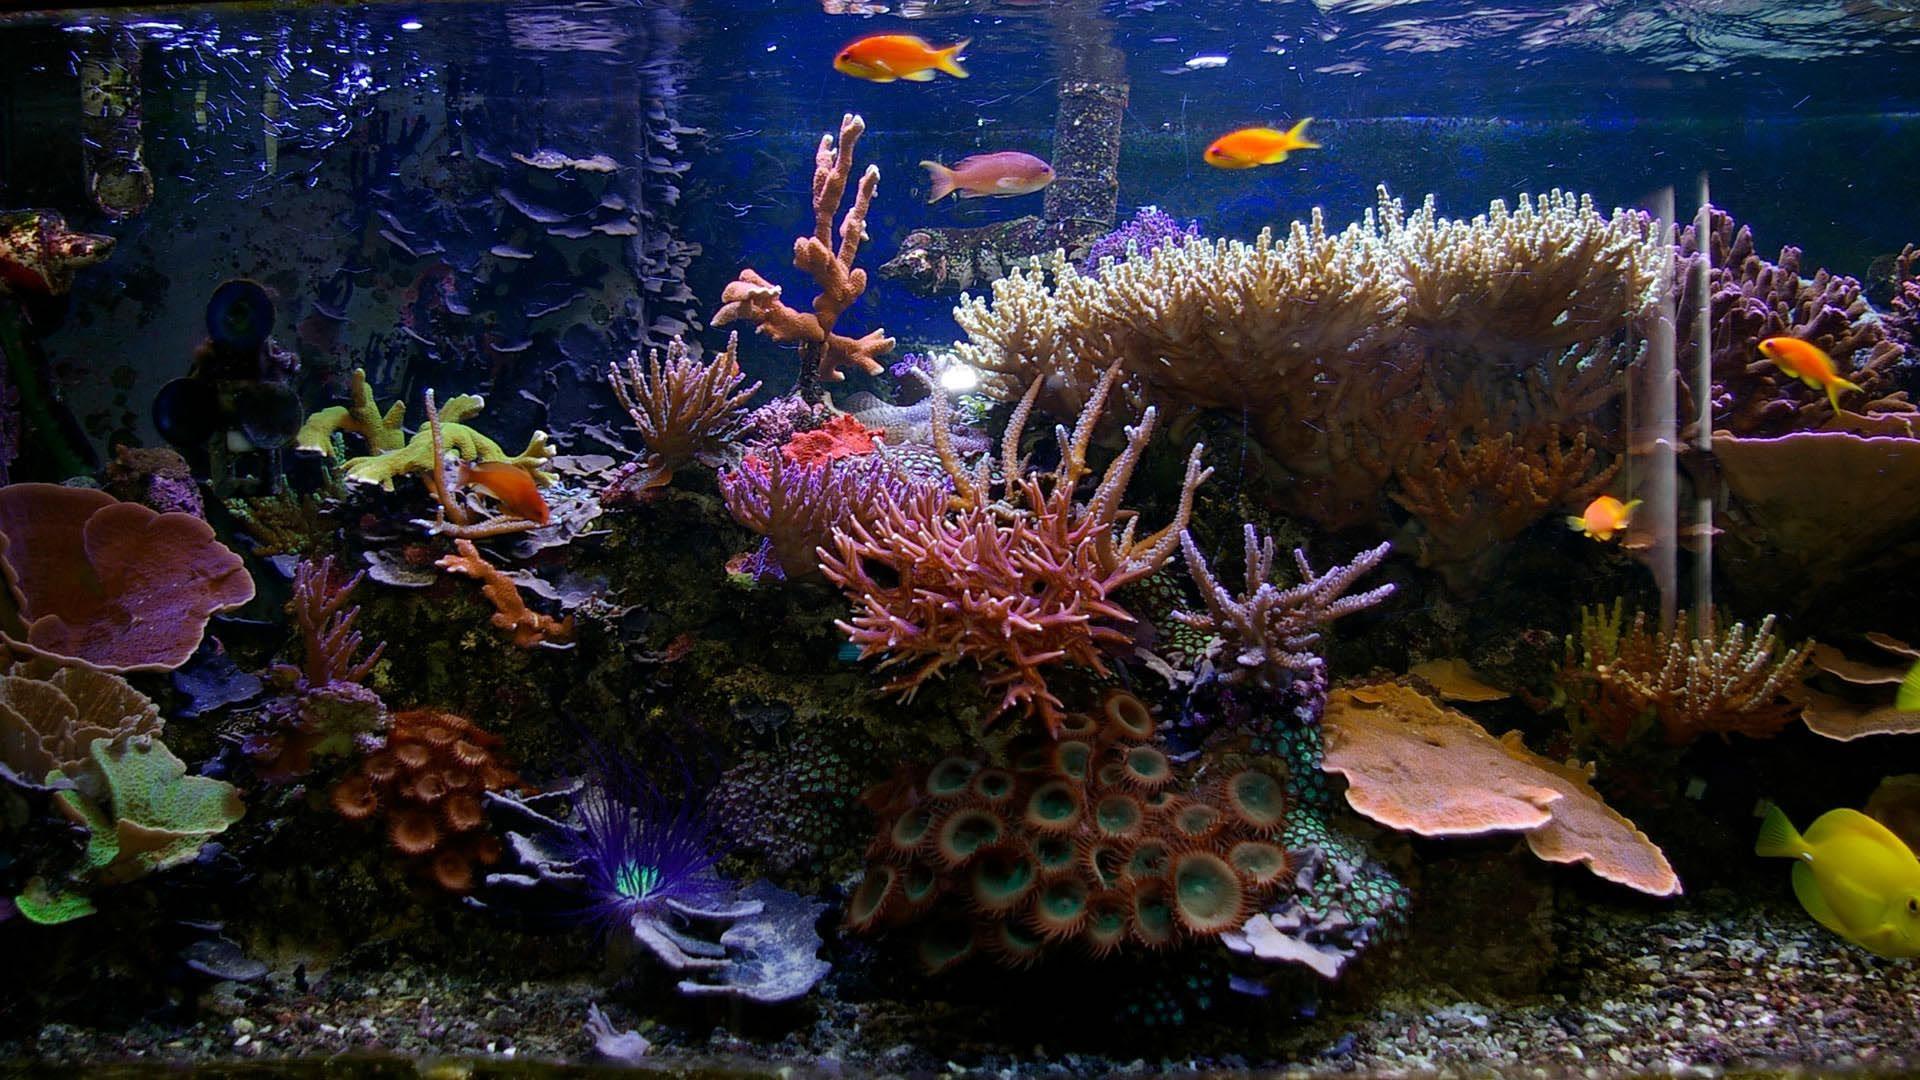 d096b9f1b1c032083f64e7277f21dce7 Frais De Aquarium Tropical Schème